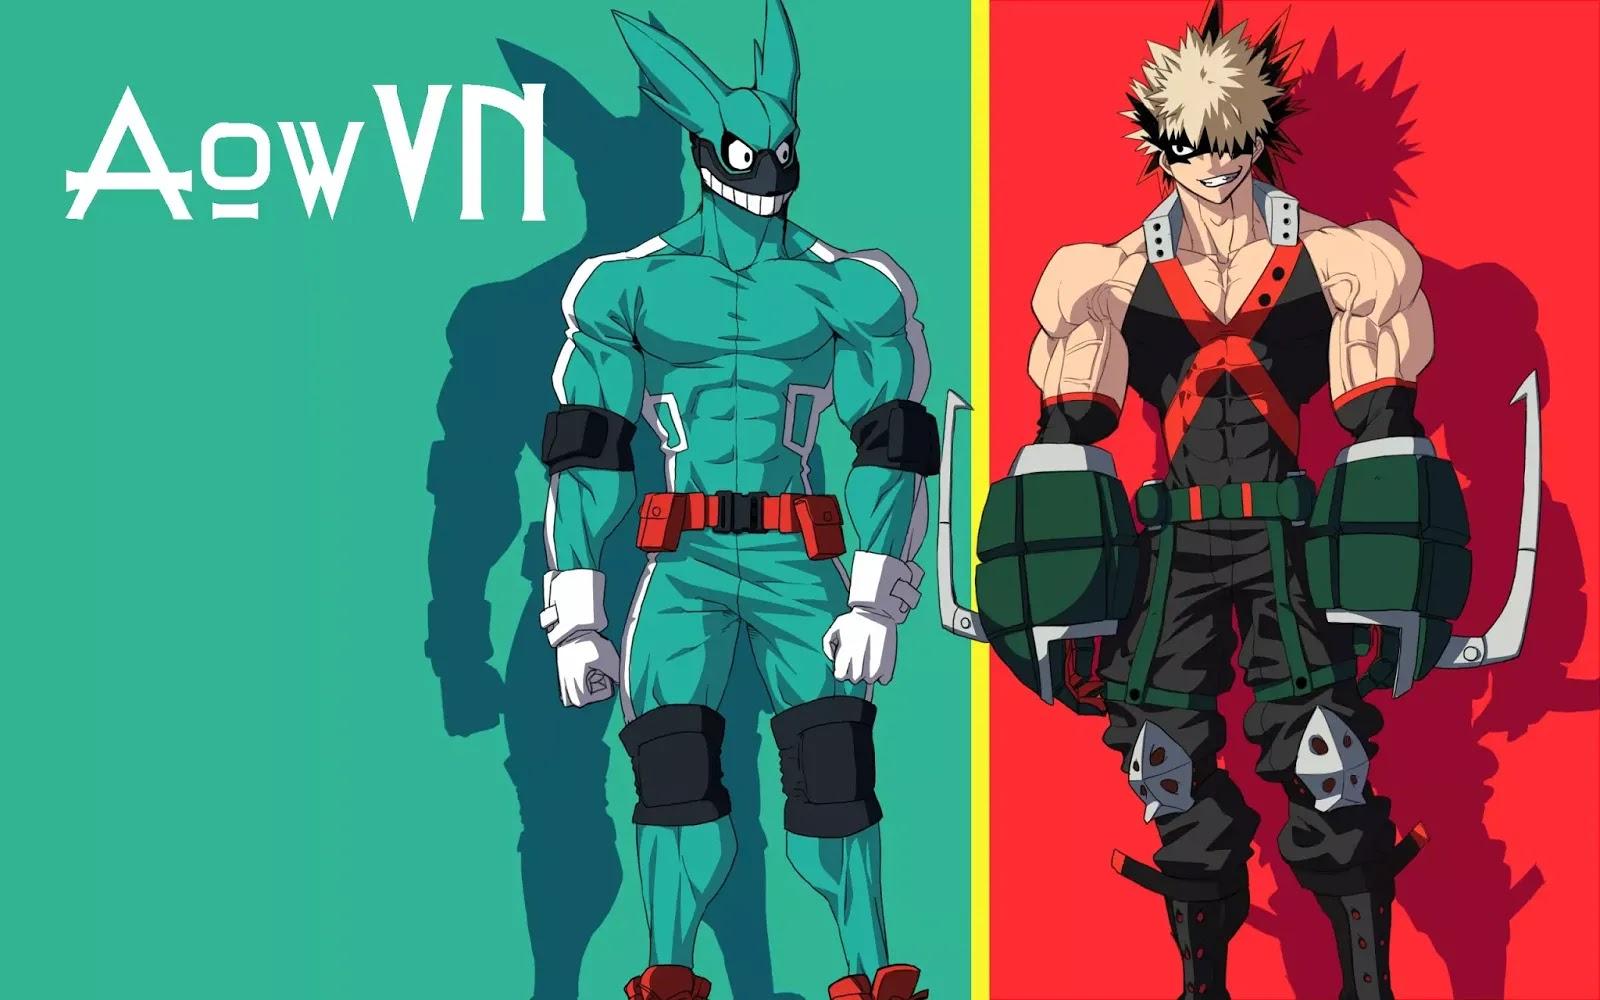 AowVN.org minz%2B%25285%2529 - [ Anime 3gp Mp4 ] Boku No Hero Academia SS1 + SS2 + OVA | Vietsub - Tuyệt Hay